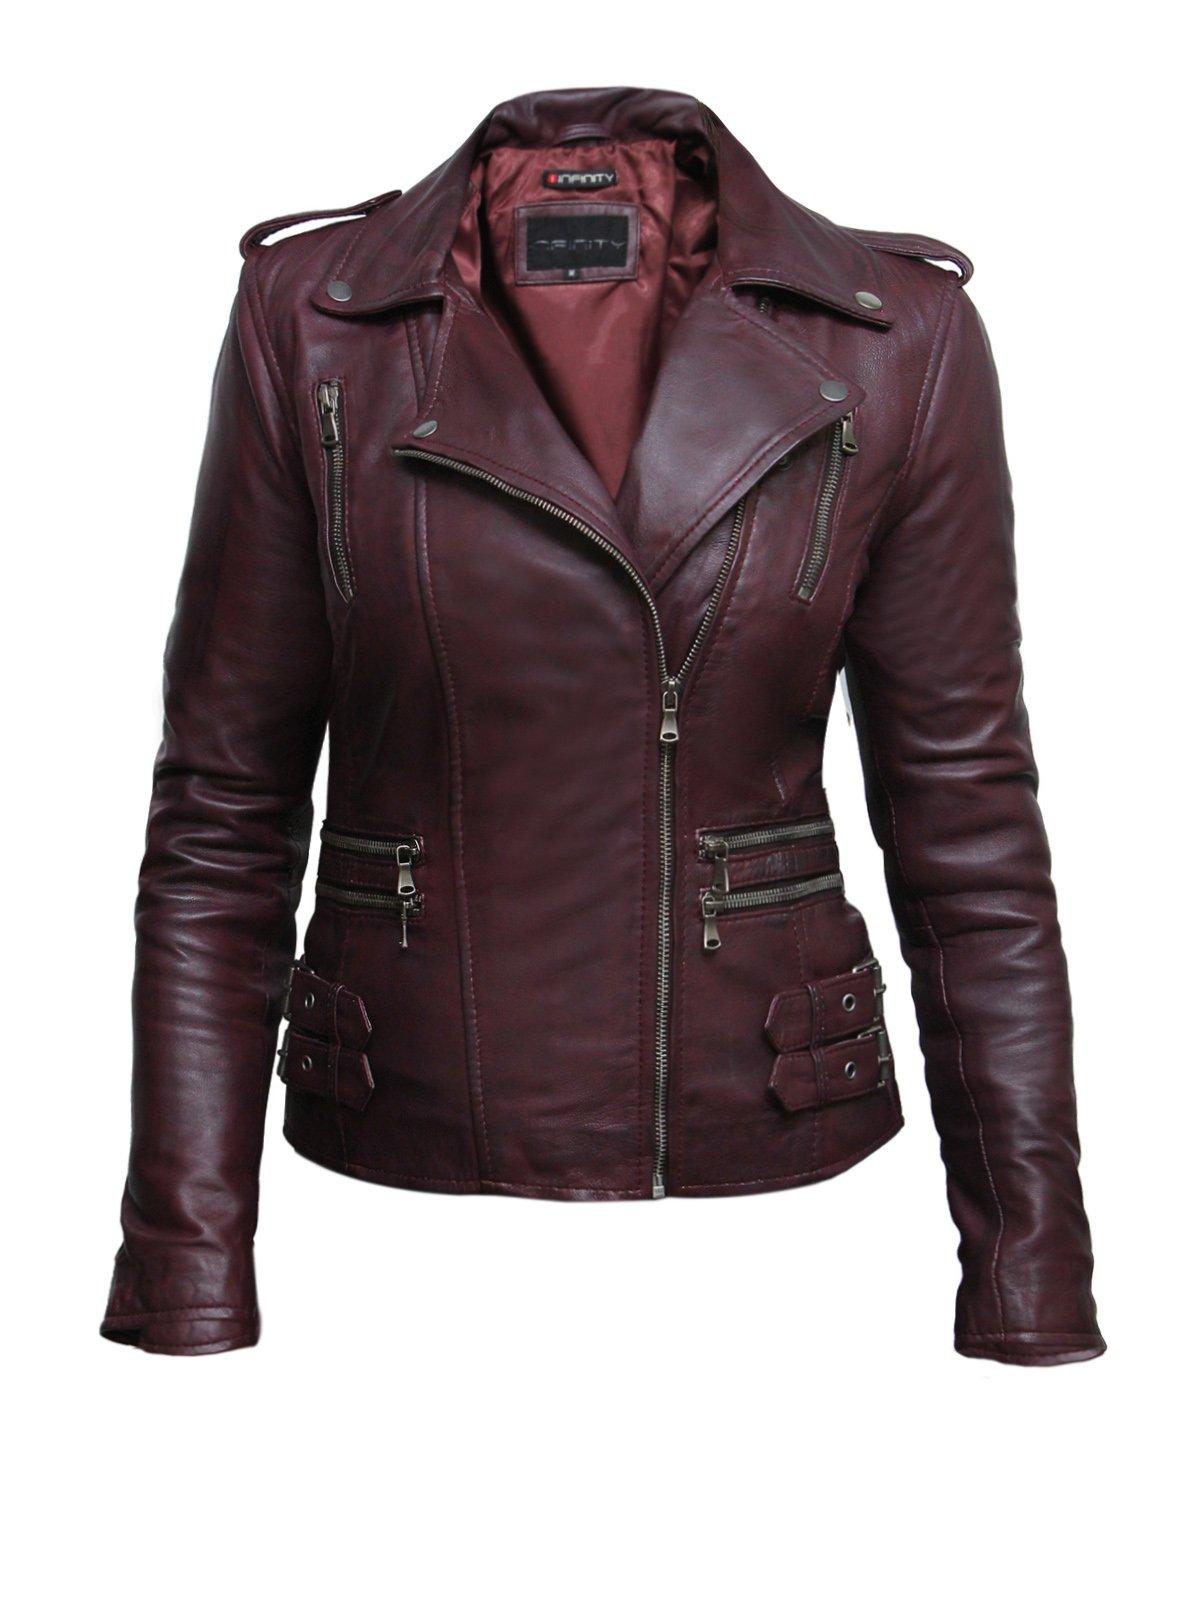 Brandslock Womens Real Leather Biker Jacket Black Fitted Bikers Style Vintage Rock (S, Brgundy)